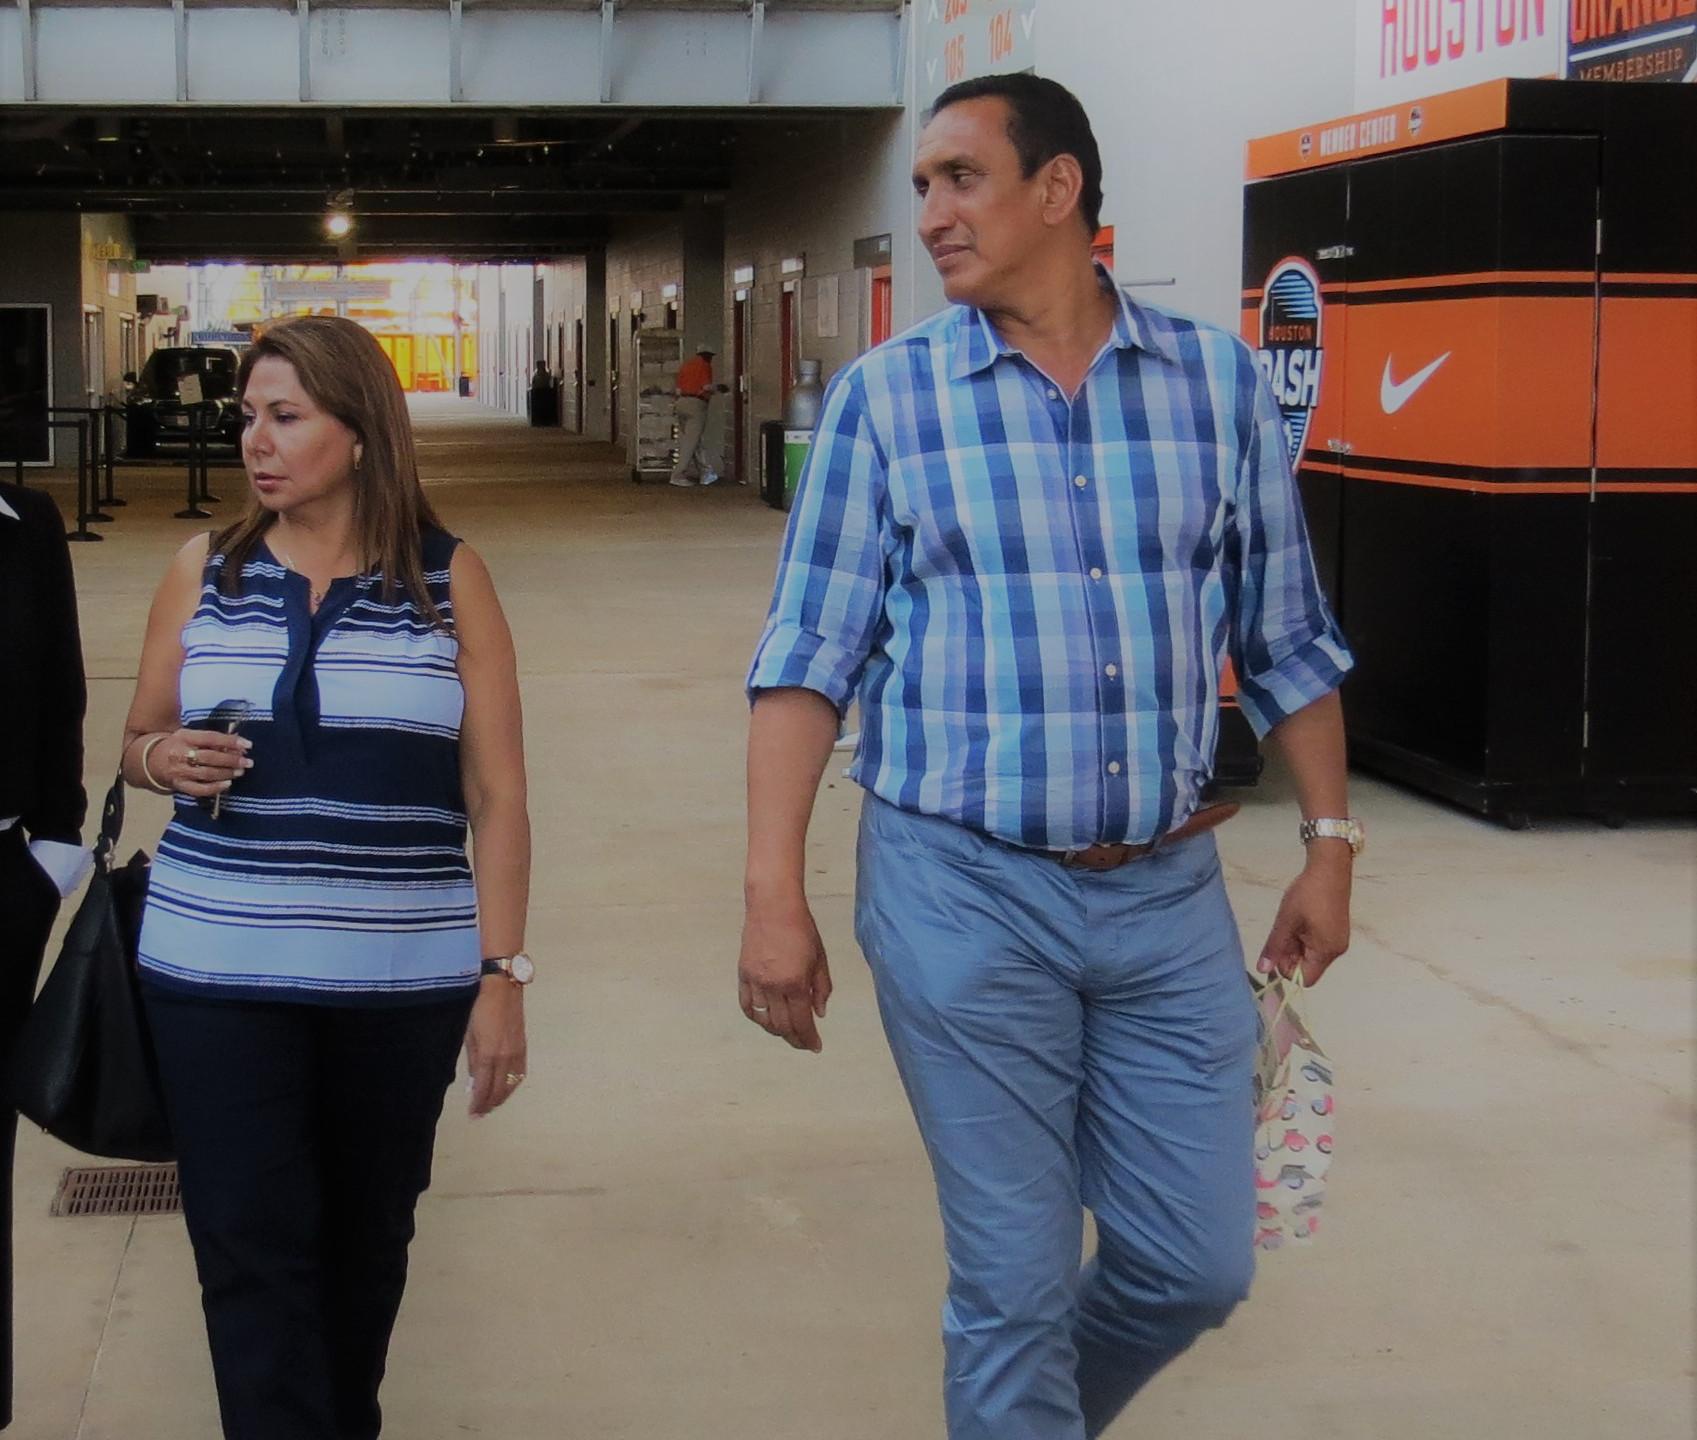 Mr. and Mrs. Uquillas